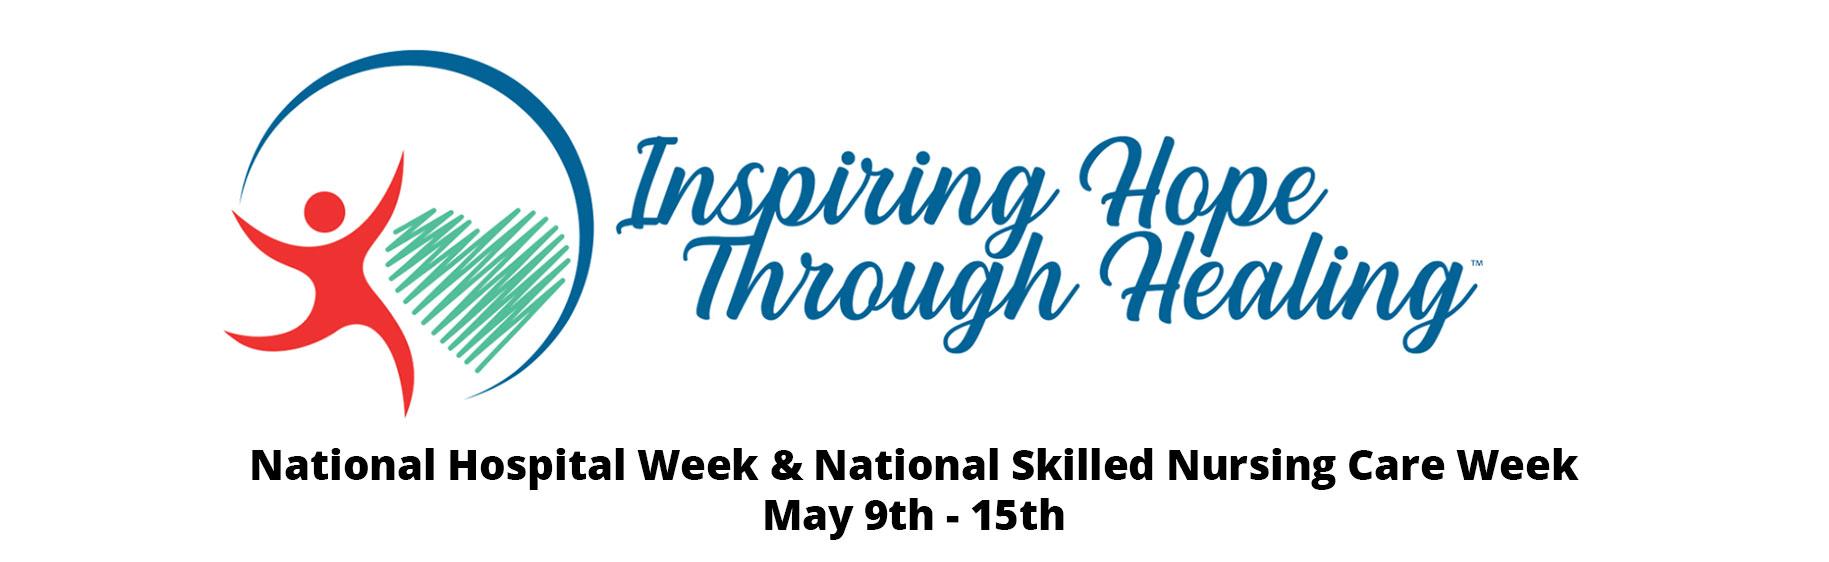 Inspiring Hope Through Healing National Hospital Week & National Skilled Nursing Care Week  May 9th - 15th